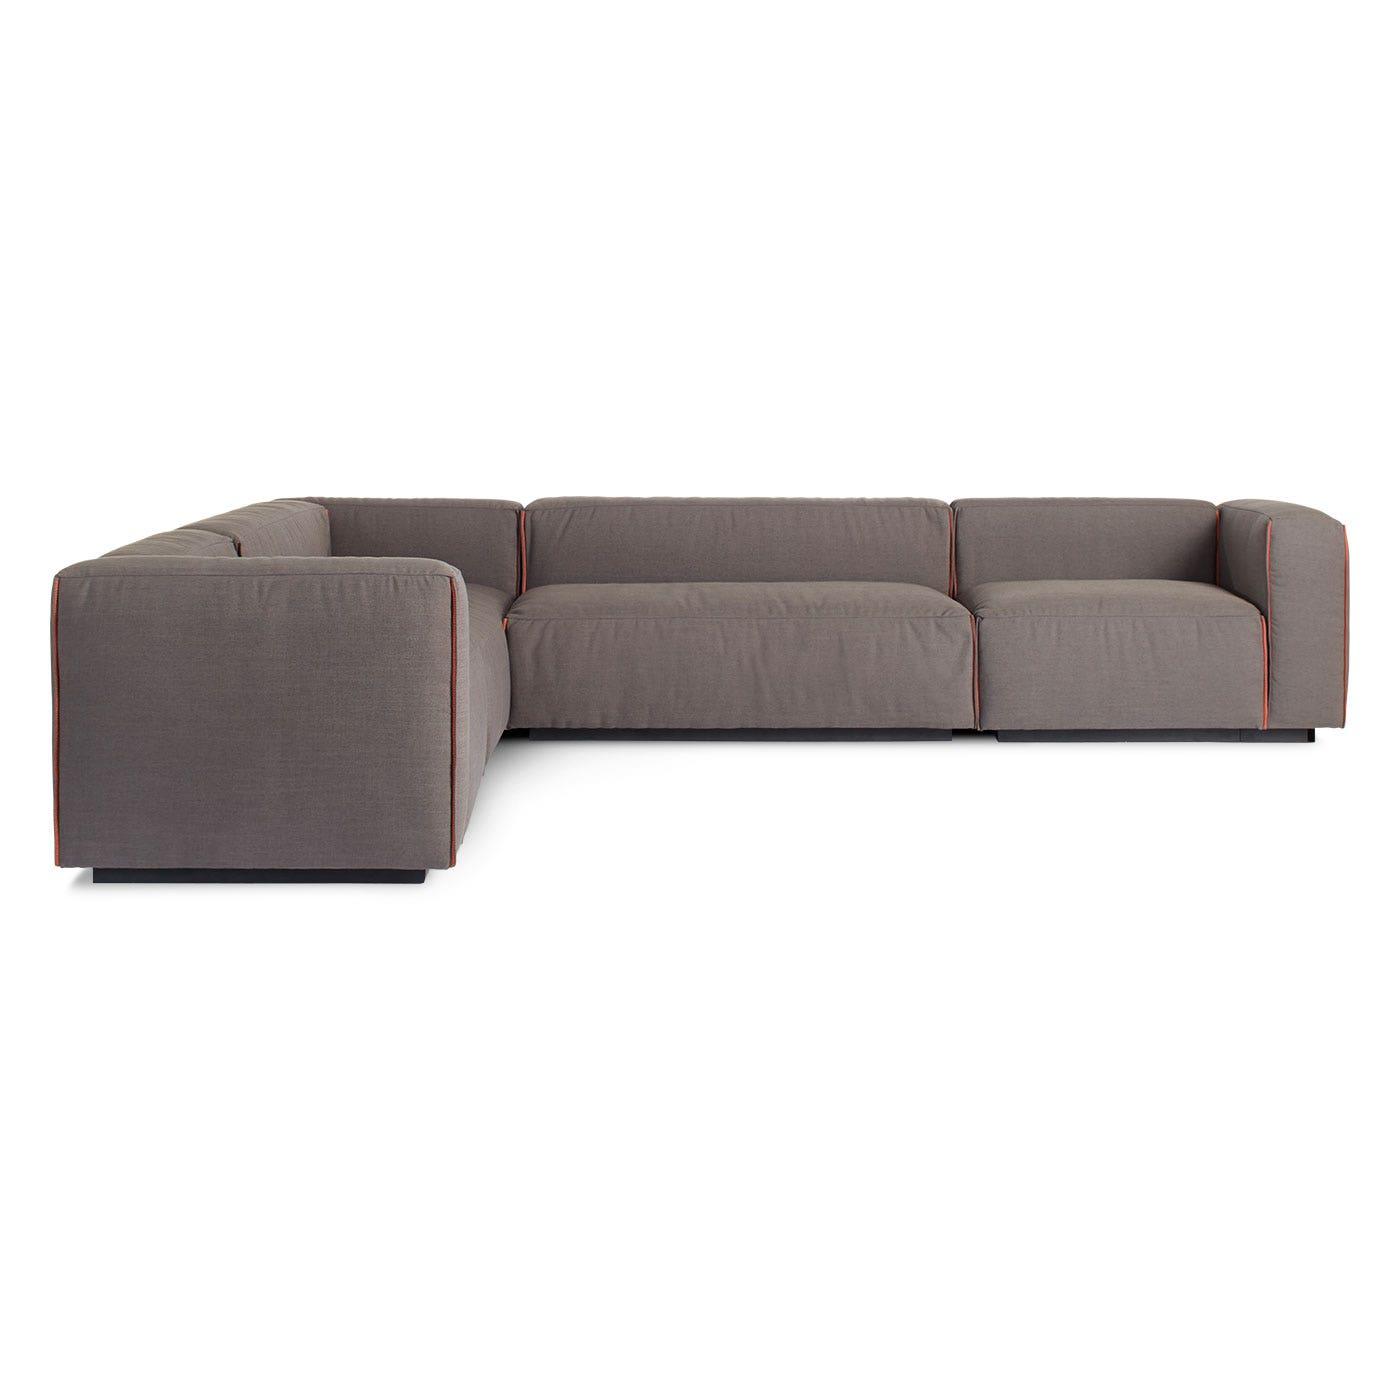 Cleon Modern Sectional Sofa